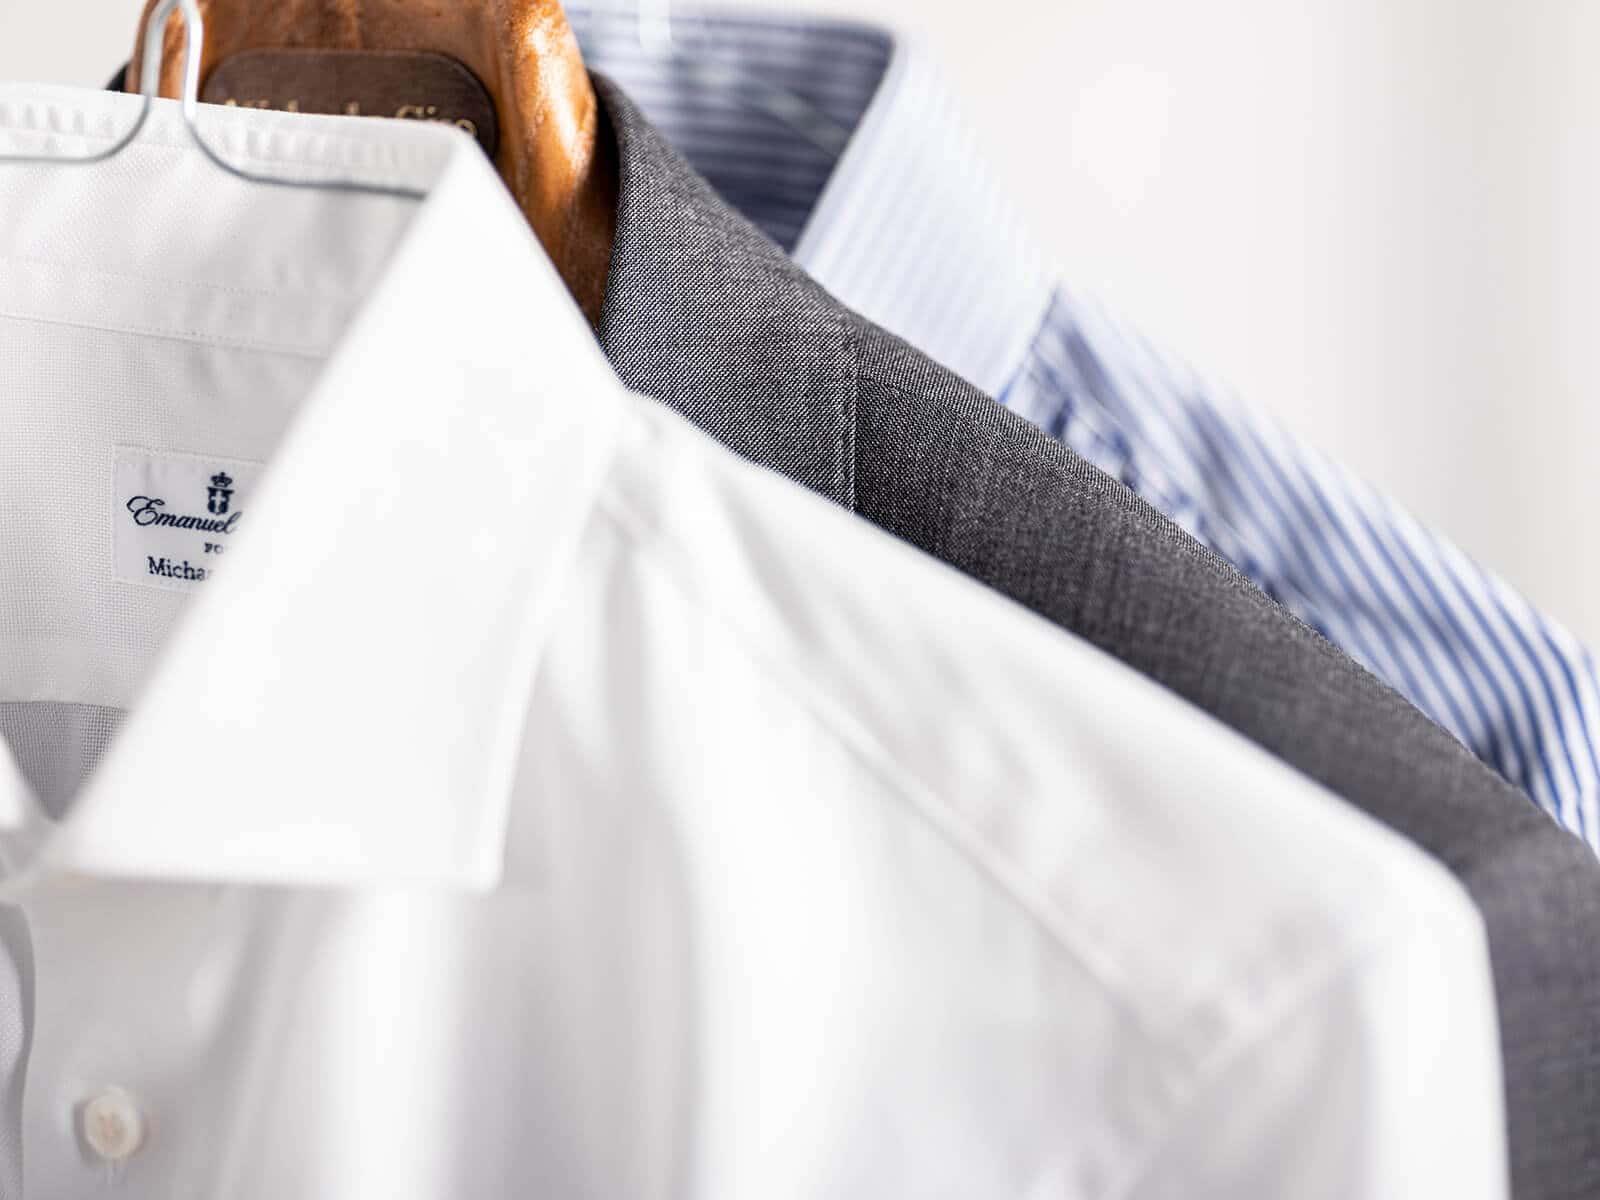 Garderobe details met maathemd en jasje